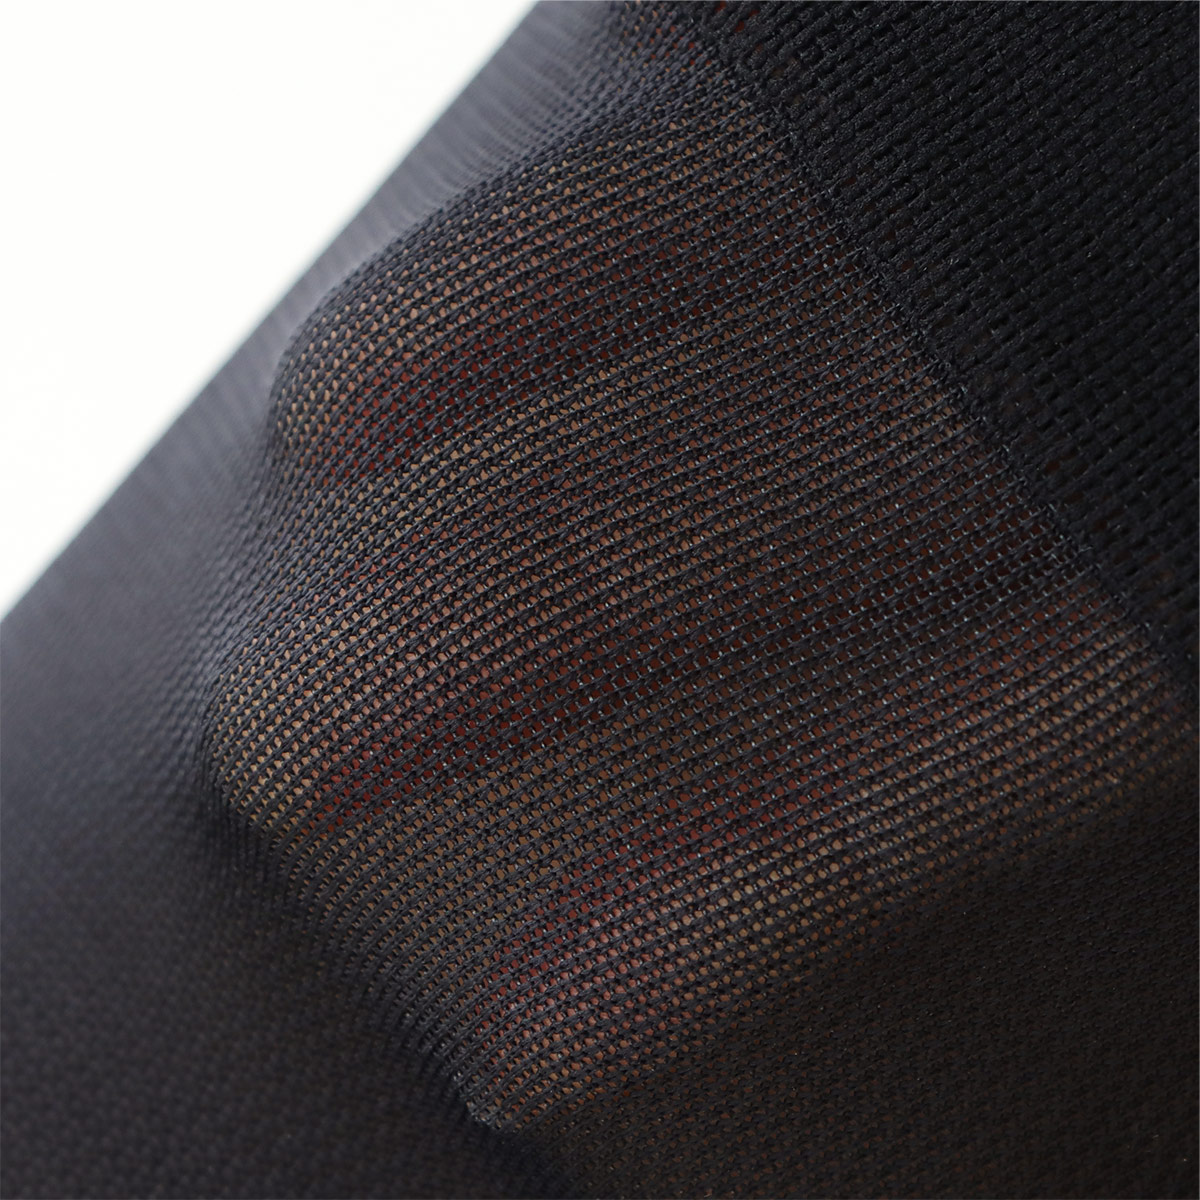 NAIGAI COMFORT ナイガイ コンフォート 一般医療機器 コンプレッション ハイソックス ハードタイプ 女性用 着圧 靴下 ソックス  女性 レディース 03070501【ゆうパケット・3点まで】